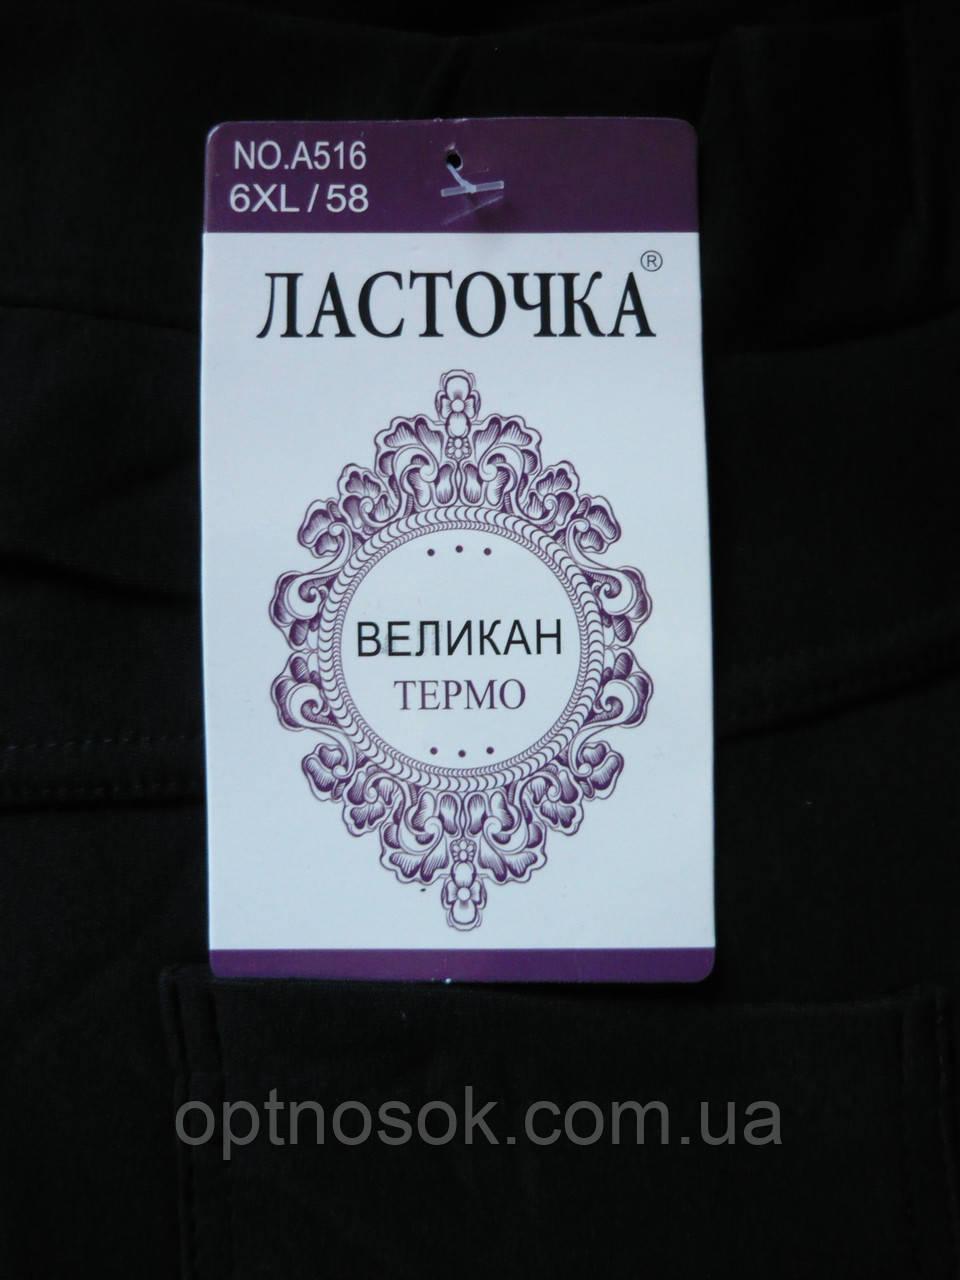 Штаны женские Ласточка. С карманами. р. 6 XL.Термо. На байке.